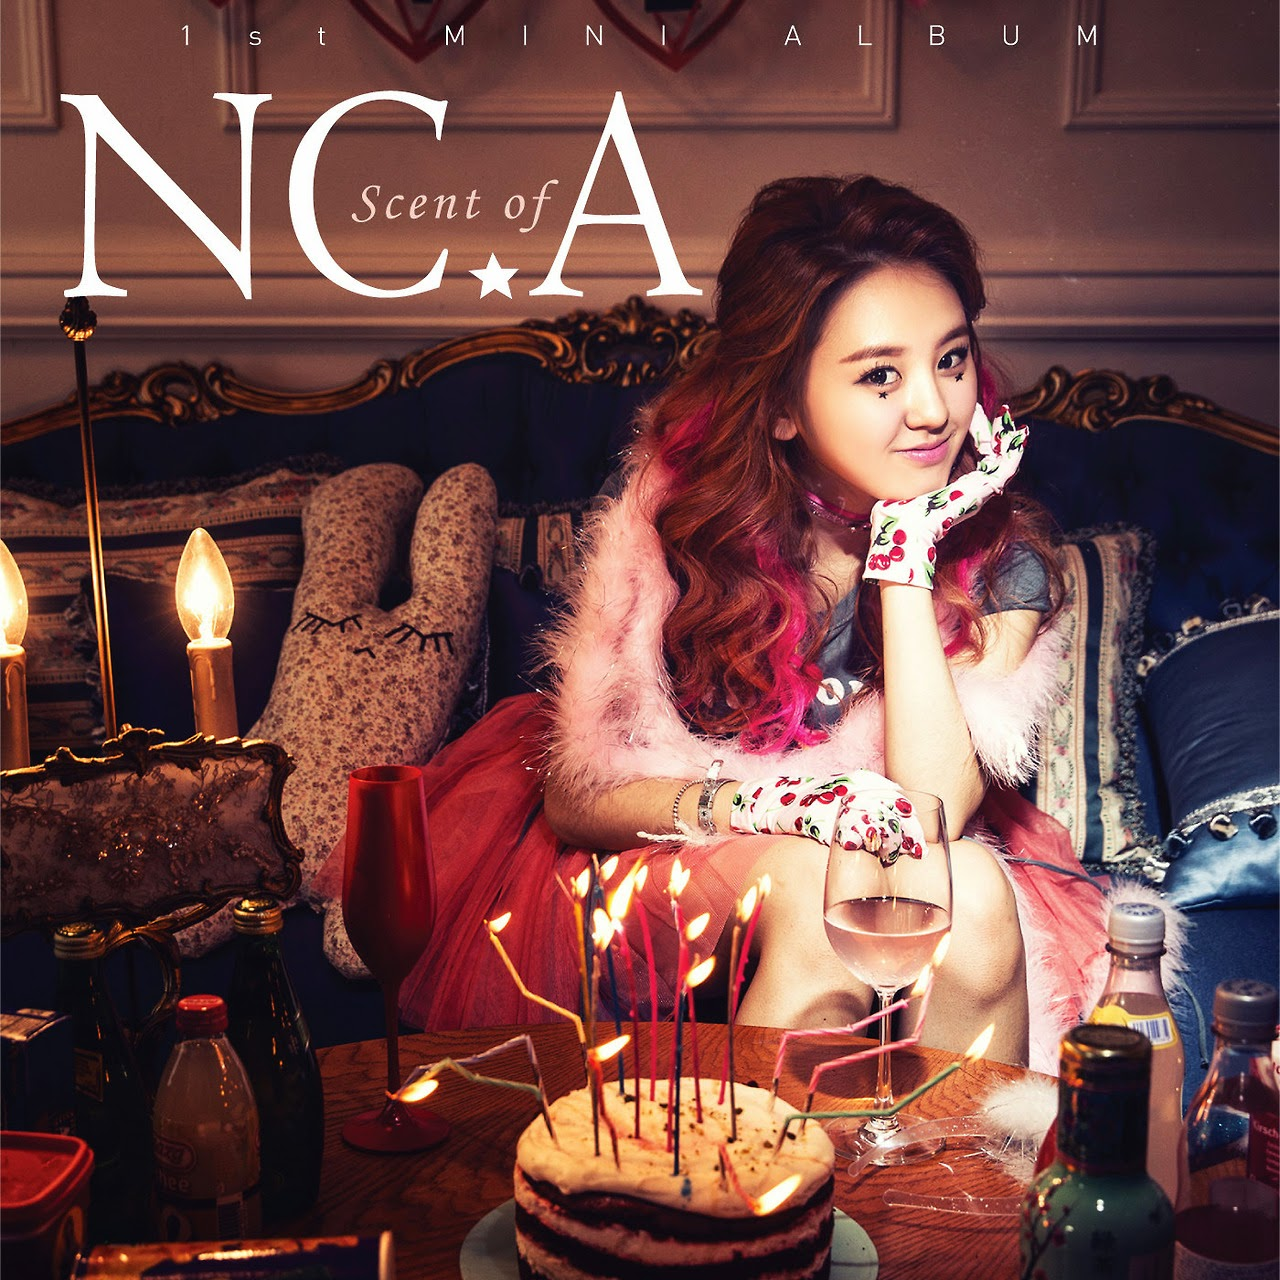 NC.A - Scent of NC.A